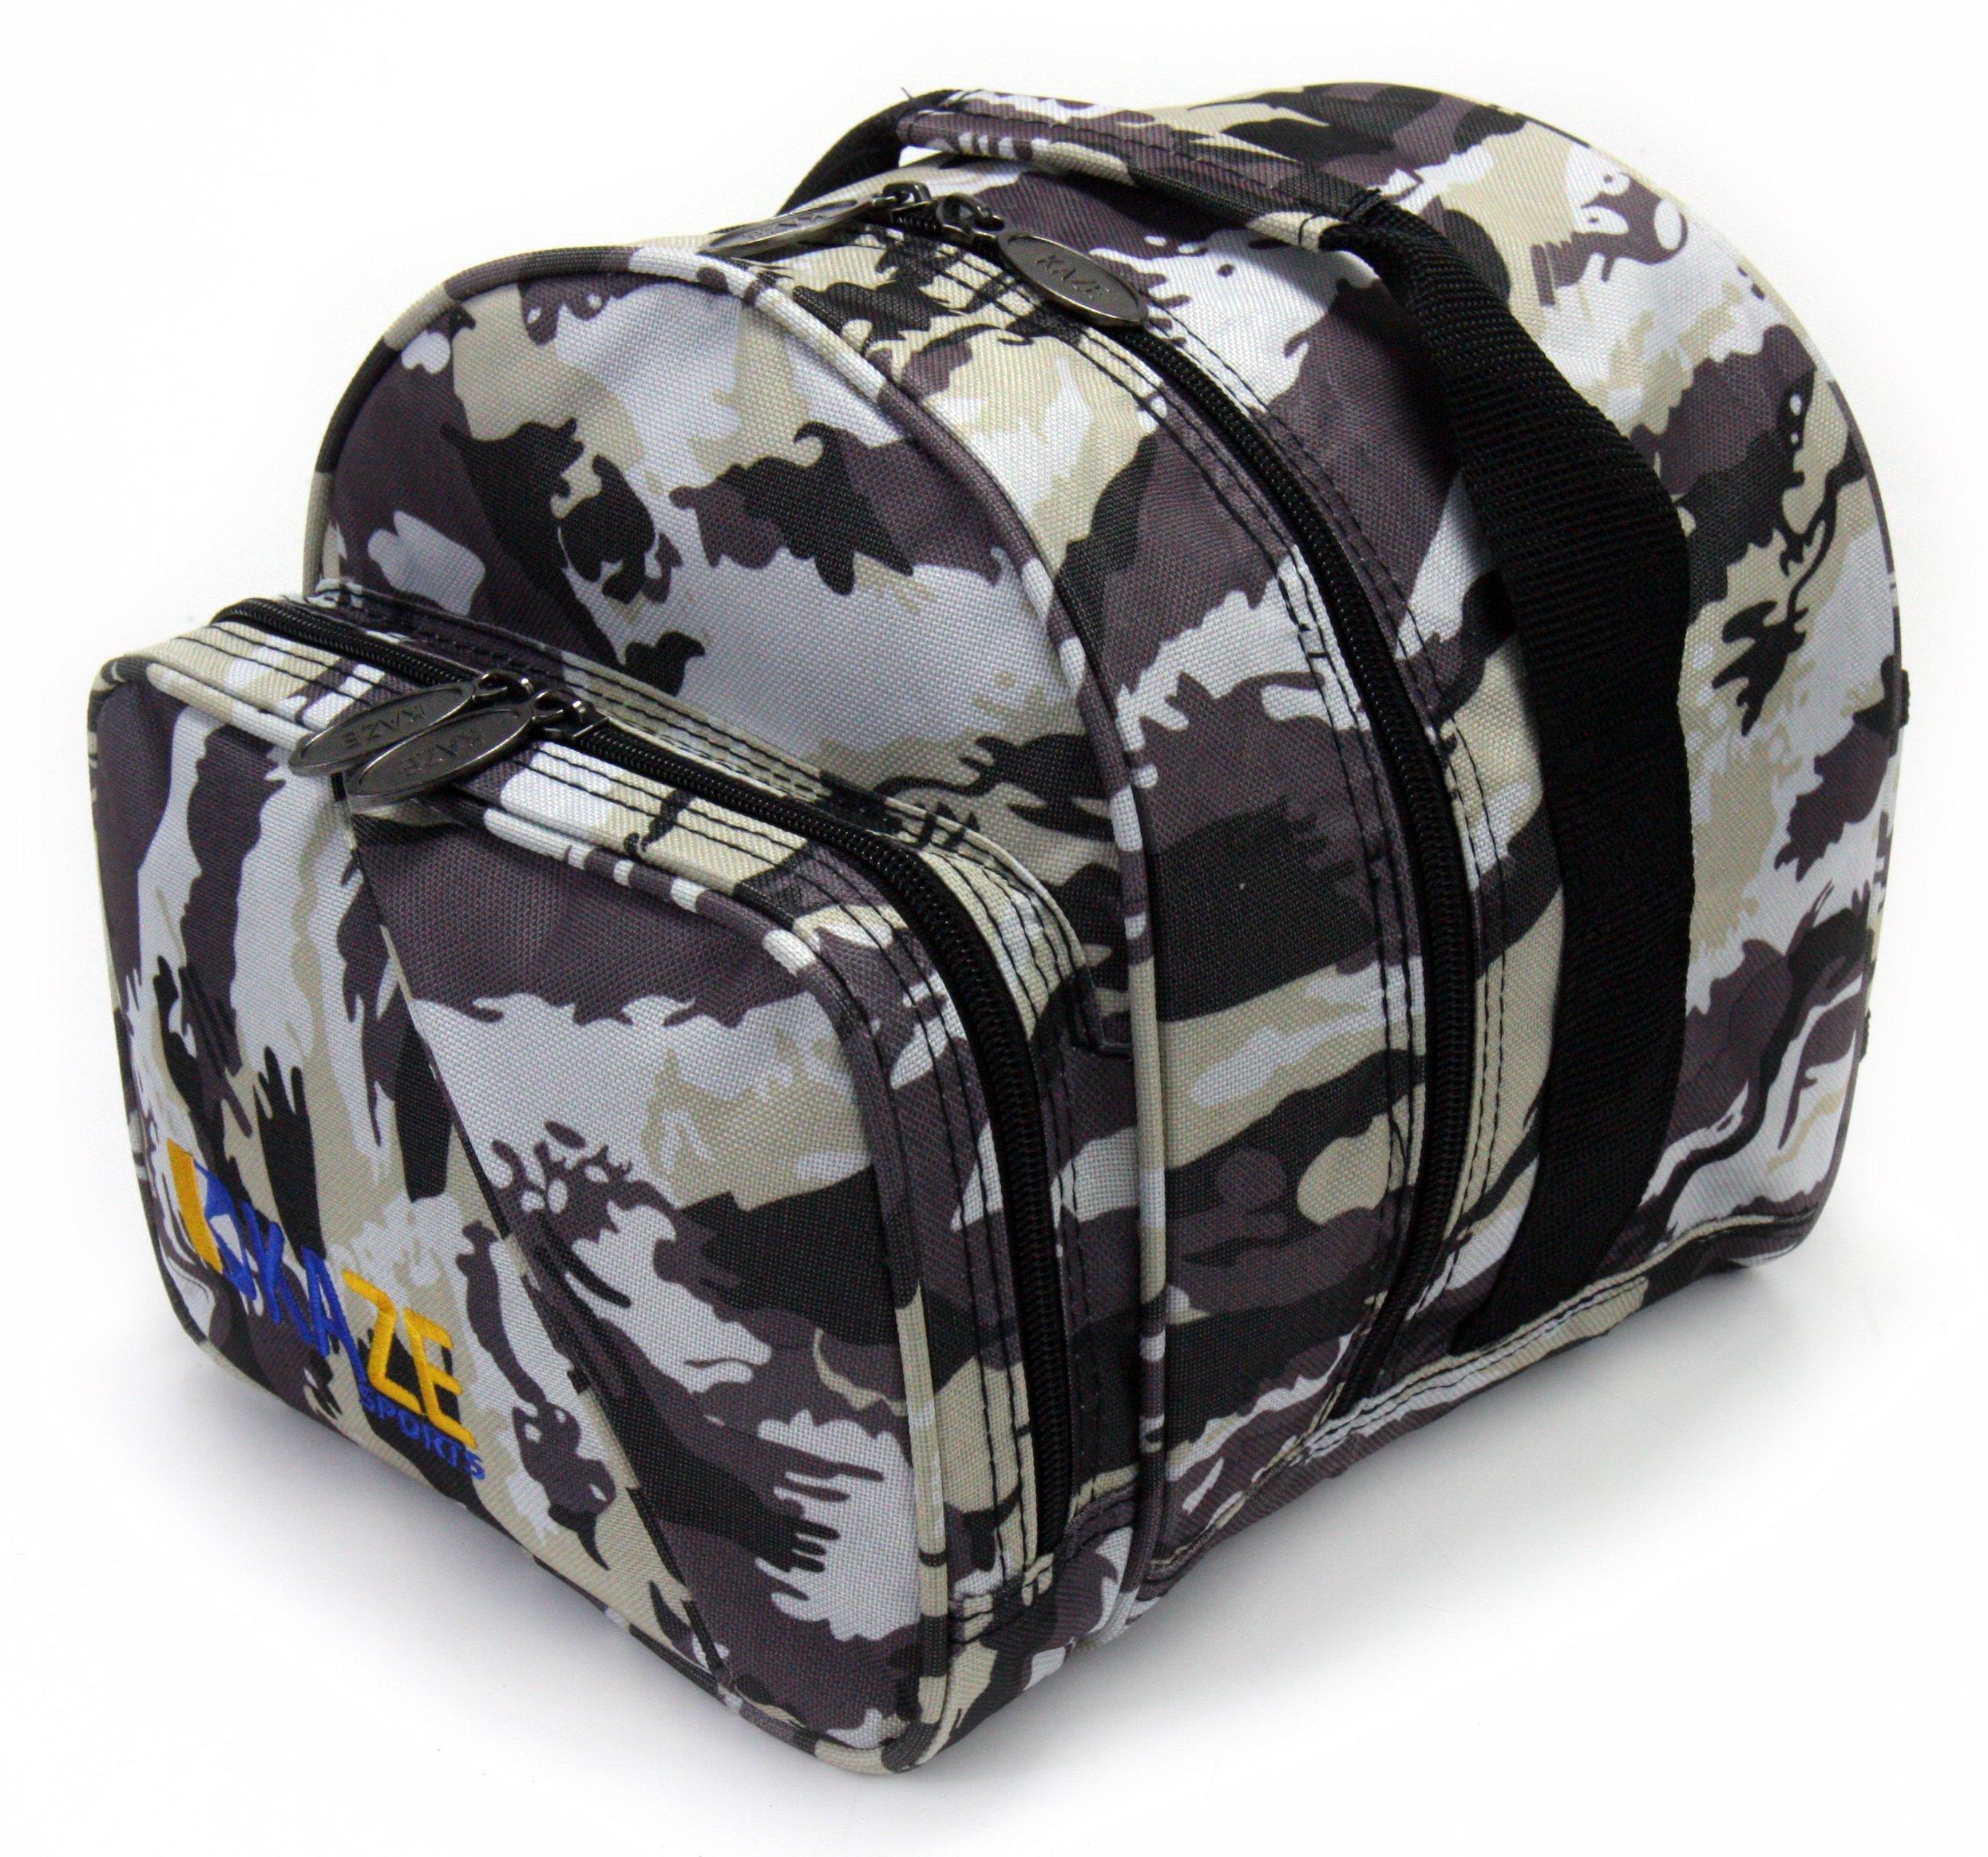 KAZE SPORTS 1 Ball Spare Kit Single Tote Bowling Add On Bag (White Camo) by KAZE SPORTS